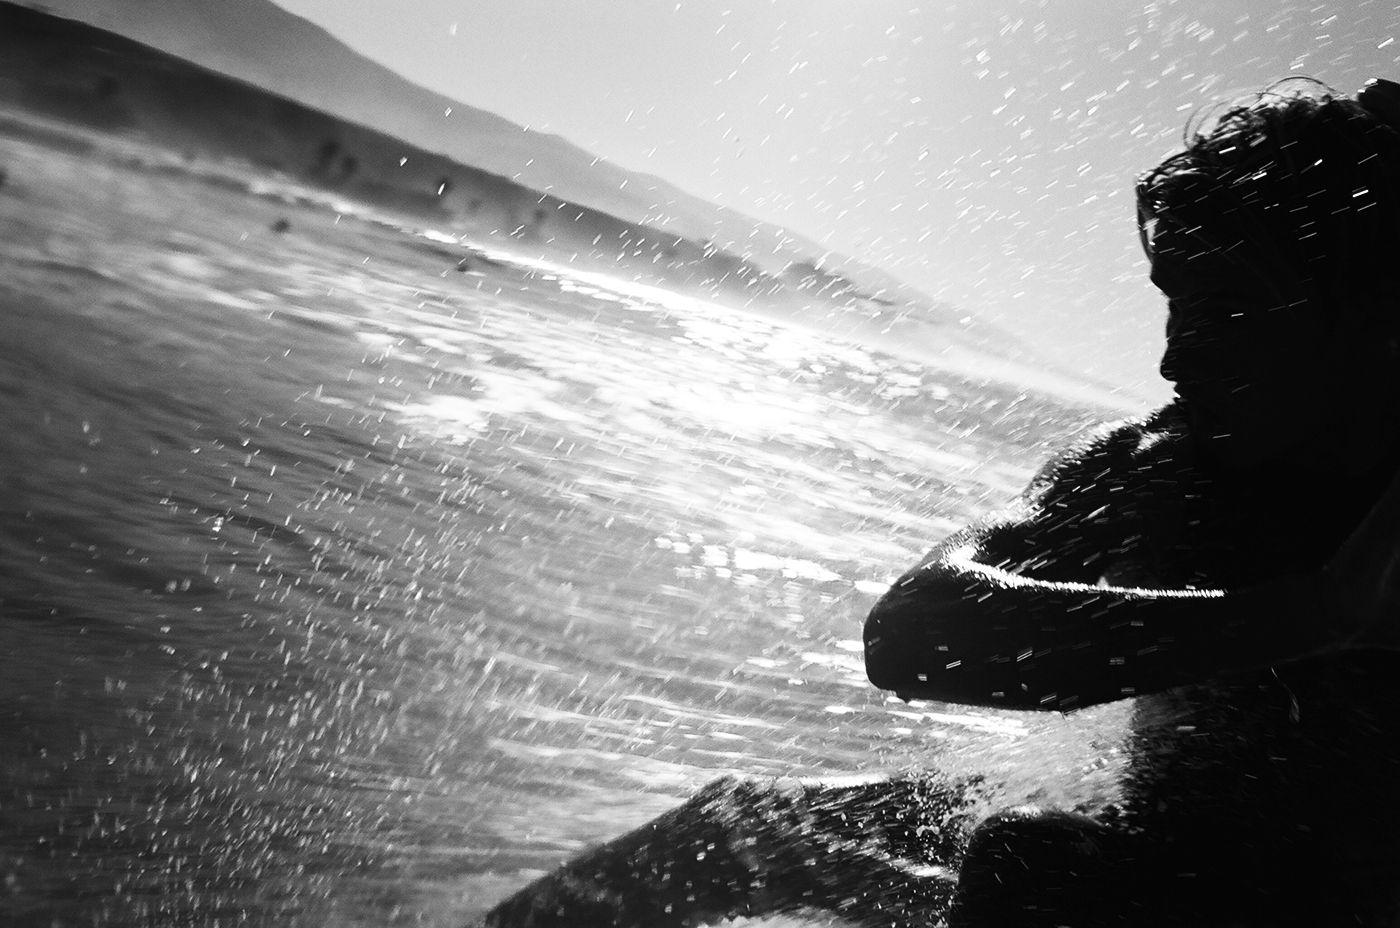 Vissla | Corey Colapinto | Photo: Kenny Hurtado #vissla #creatorsandinnovators #surf #skying #longboard #coreycolapinto #kennyhurtado